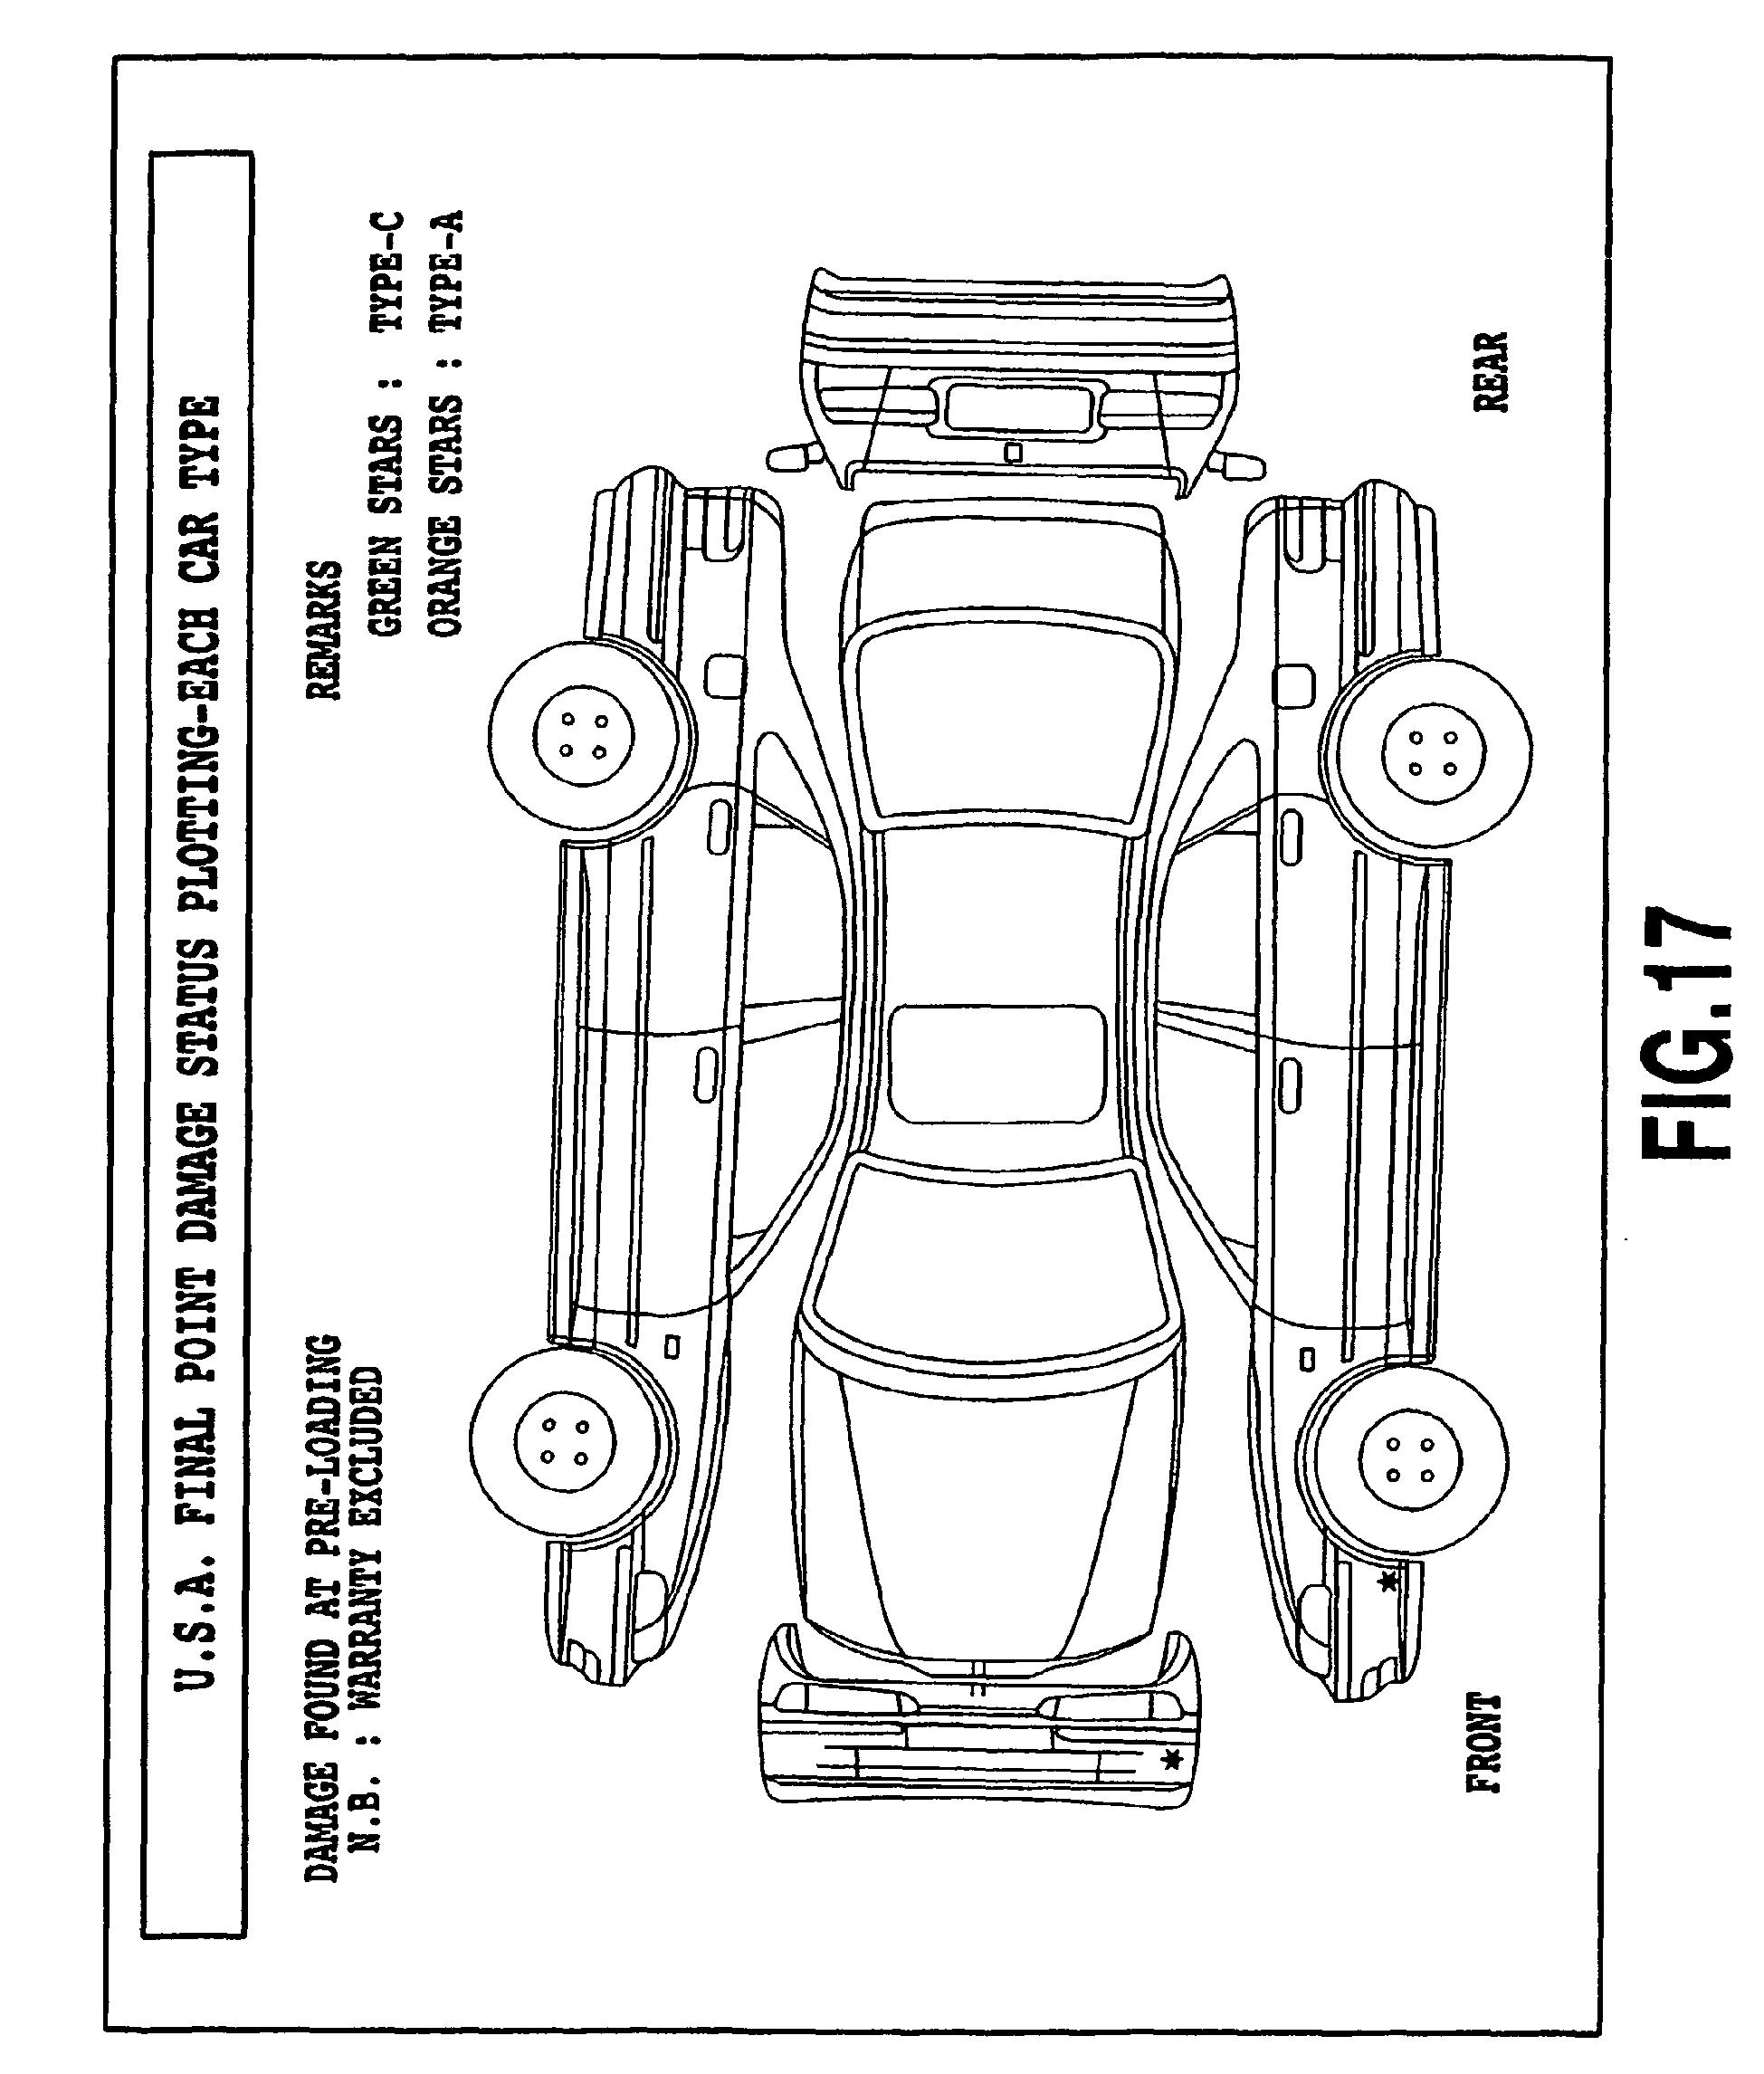 Bertrandt besides Tech Data Vivaro  bi I208711230 besides File Lunar Rover diagram together with Rear Brake Drum 1976 Ford F250 further OULXE59 0010675 54 16AUG04 1. on vehicle inspection